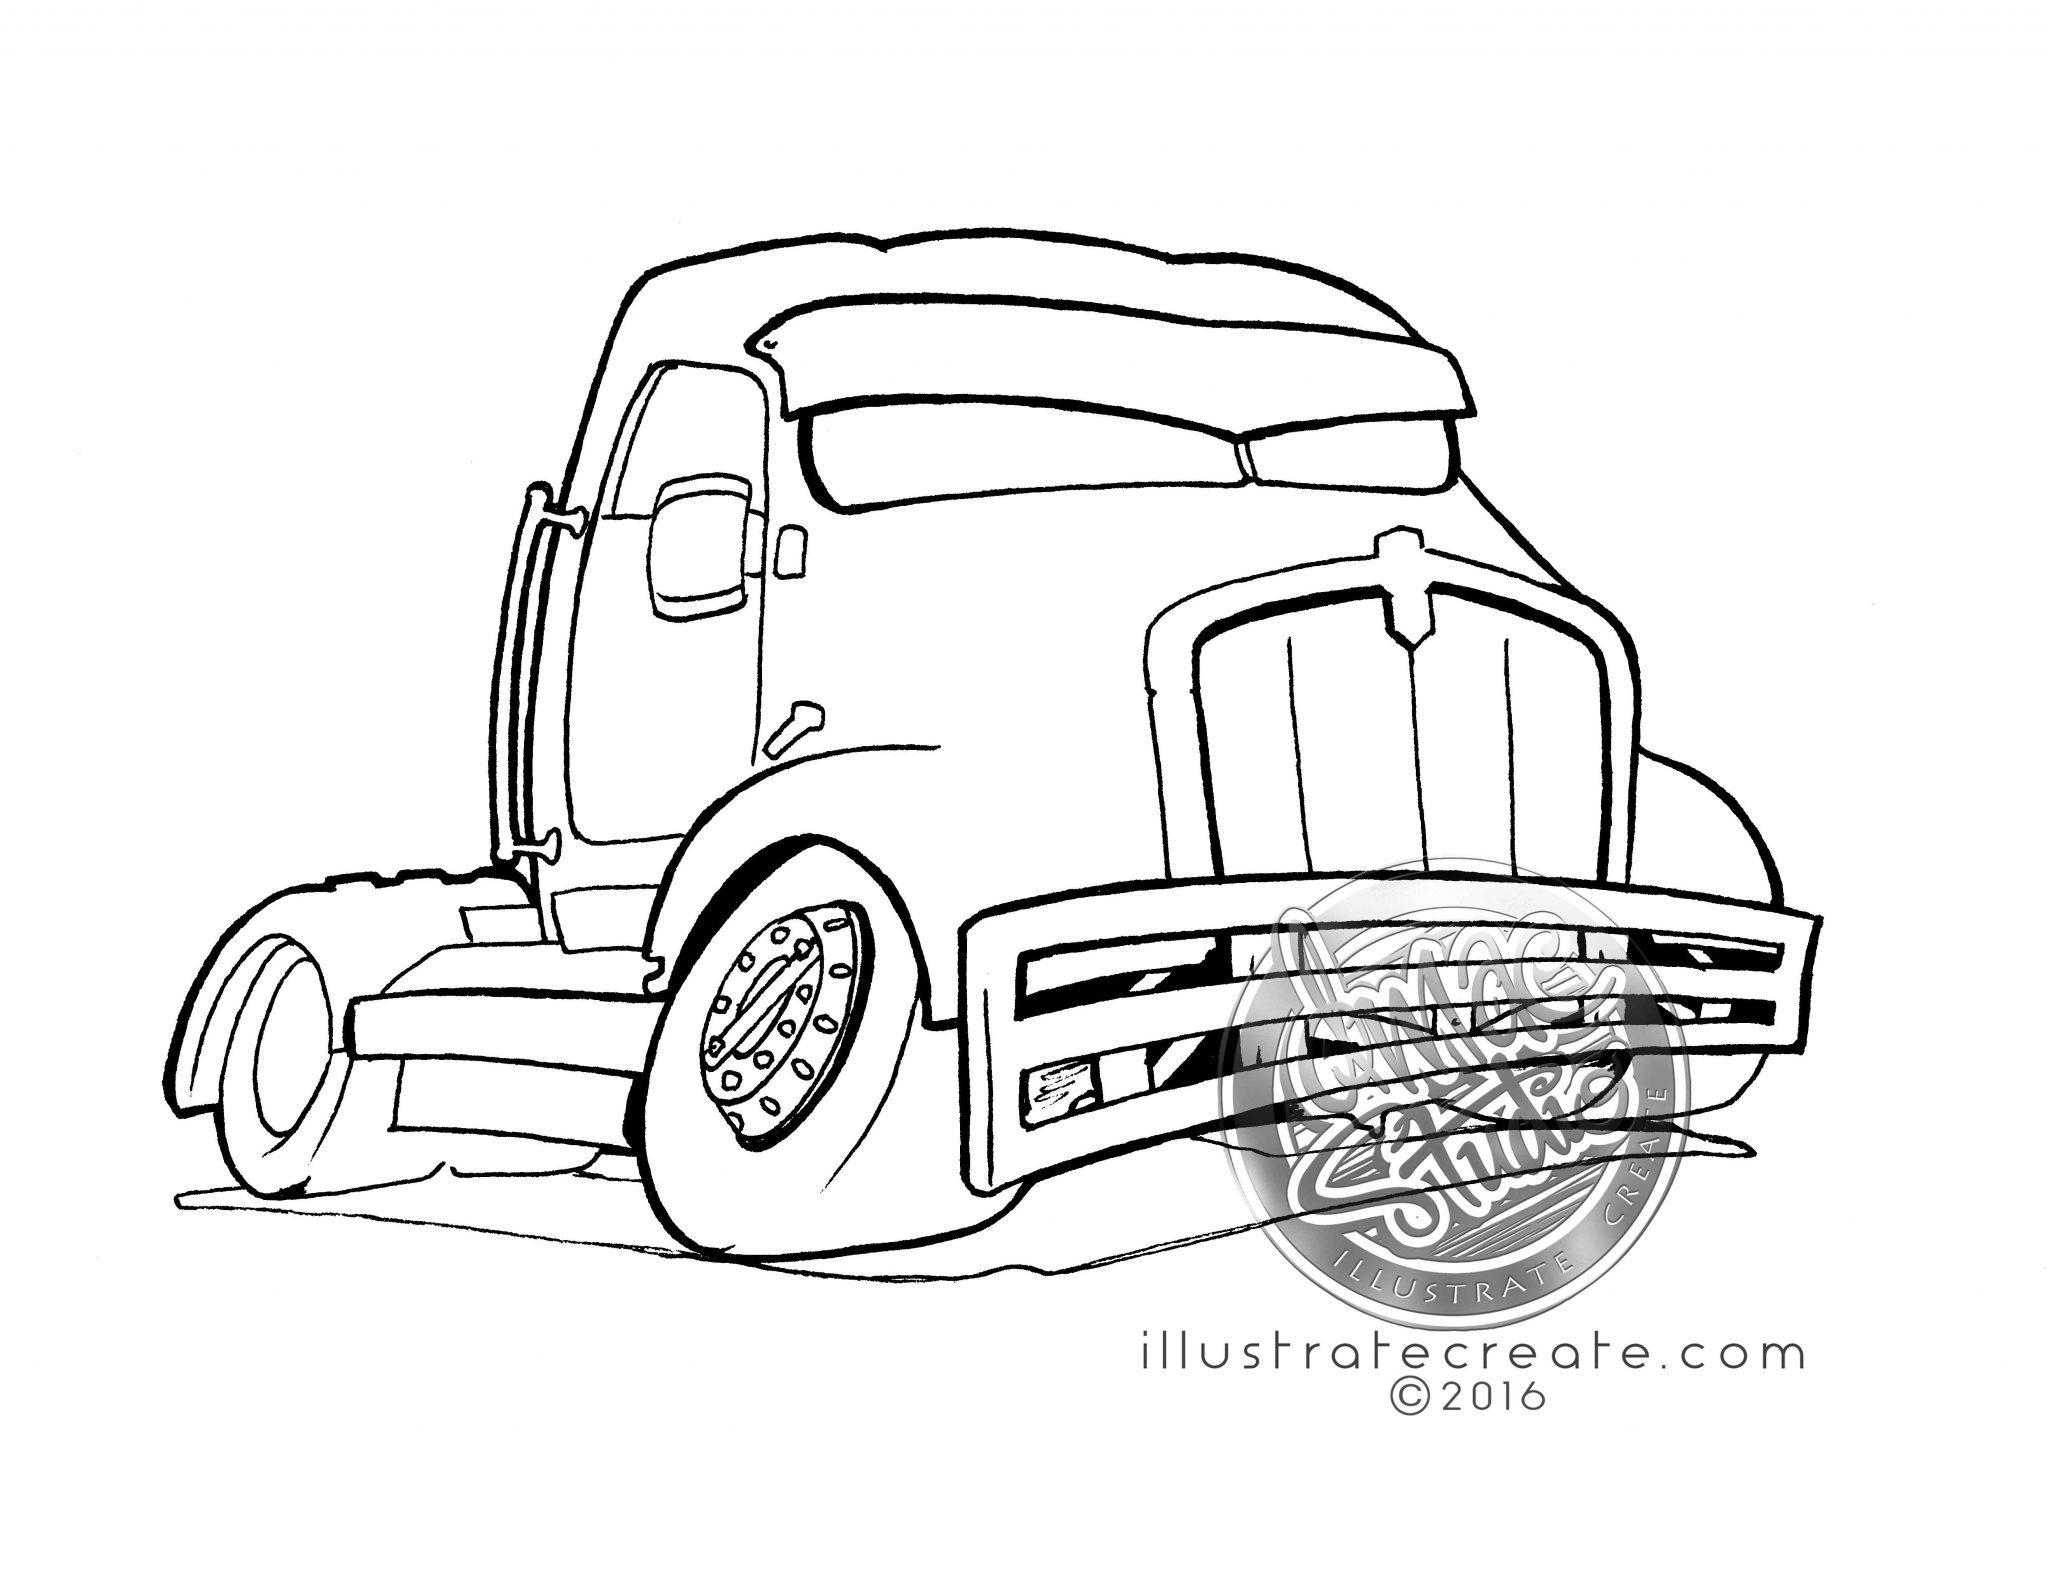 2048x1573 Graphic Design And Graphic Art, Dmac Studio, Illustrate Create